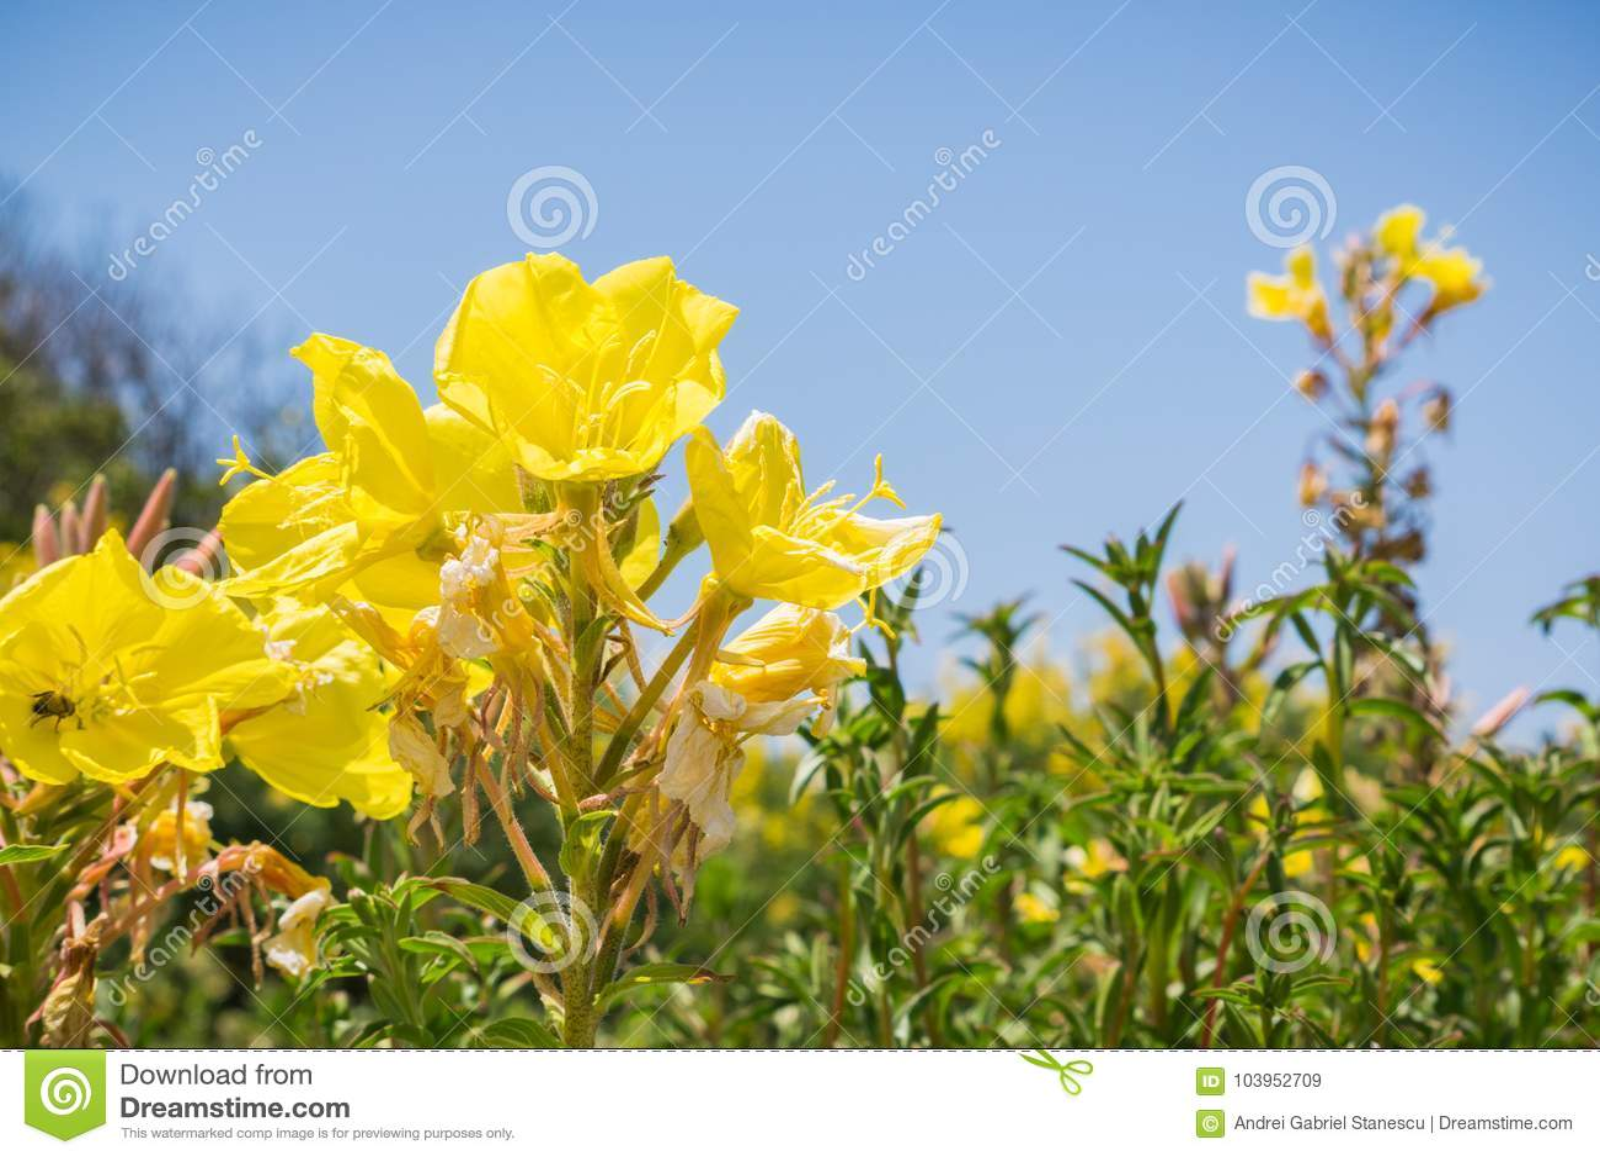 Hooker`s evening primrose Oenothera elata wildflower blooming on the Pacific Ocean coastline, California